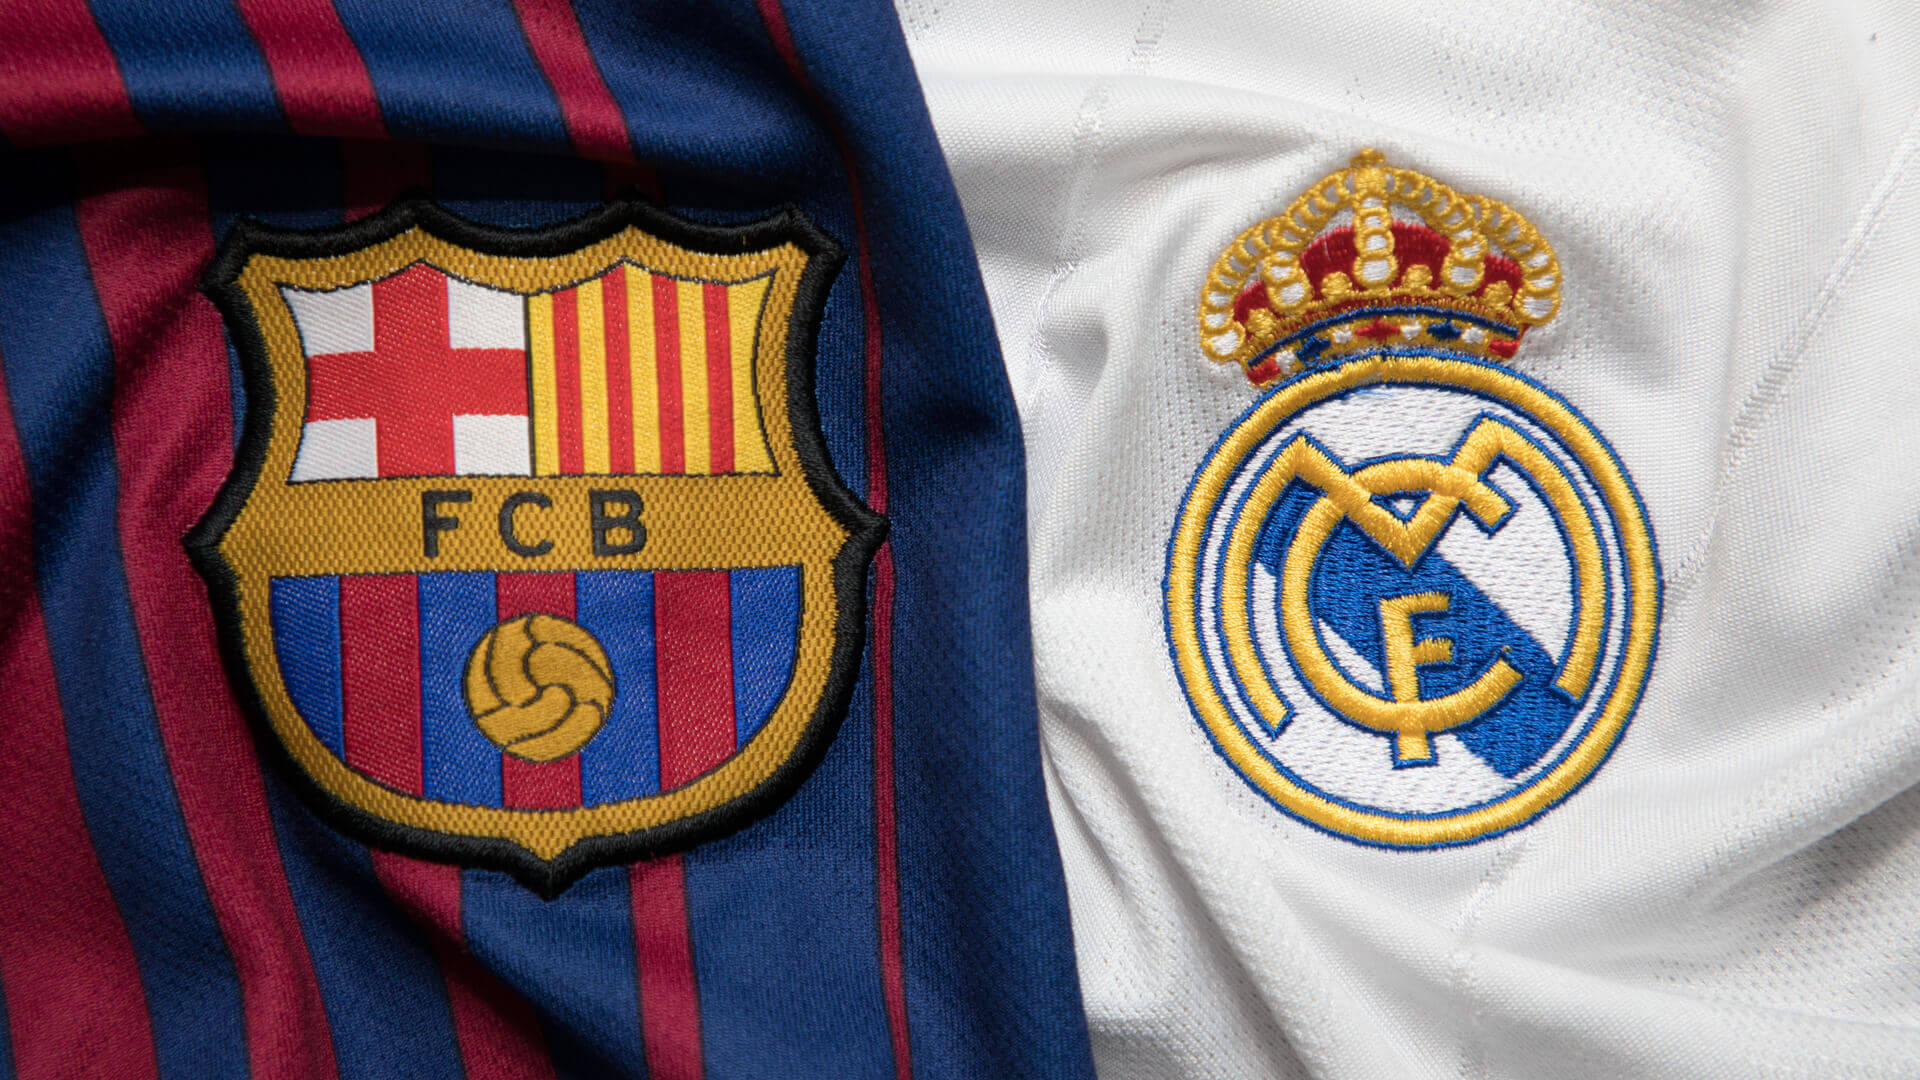 El Clasico - Barcelona vs Real